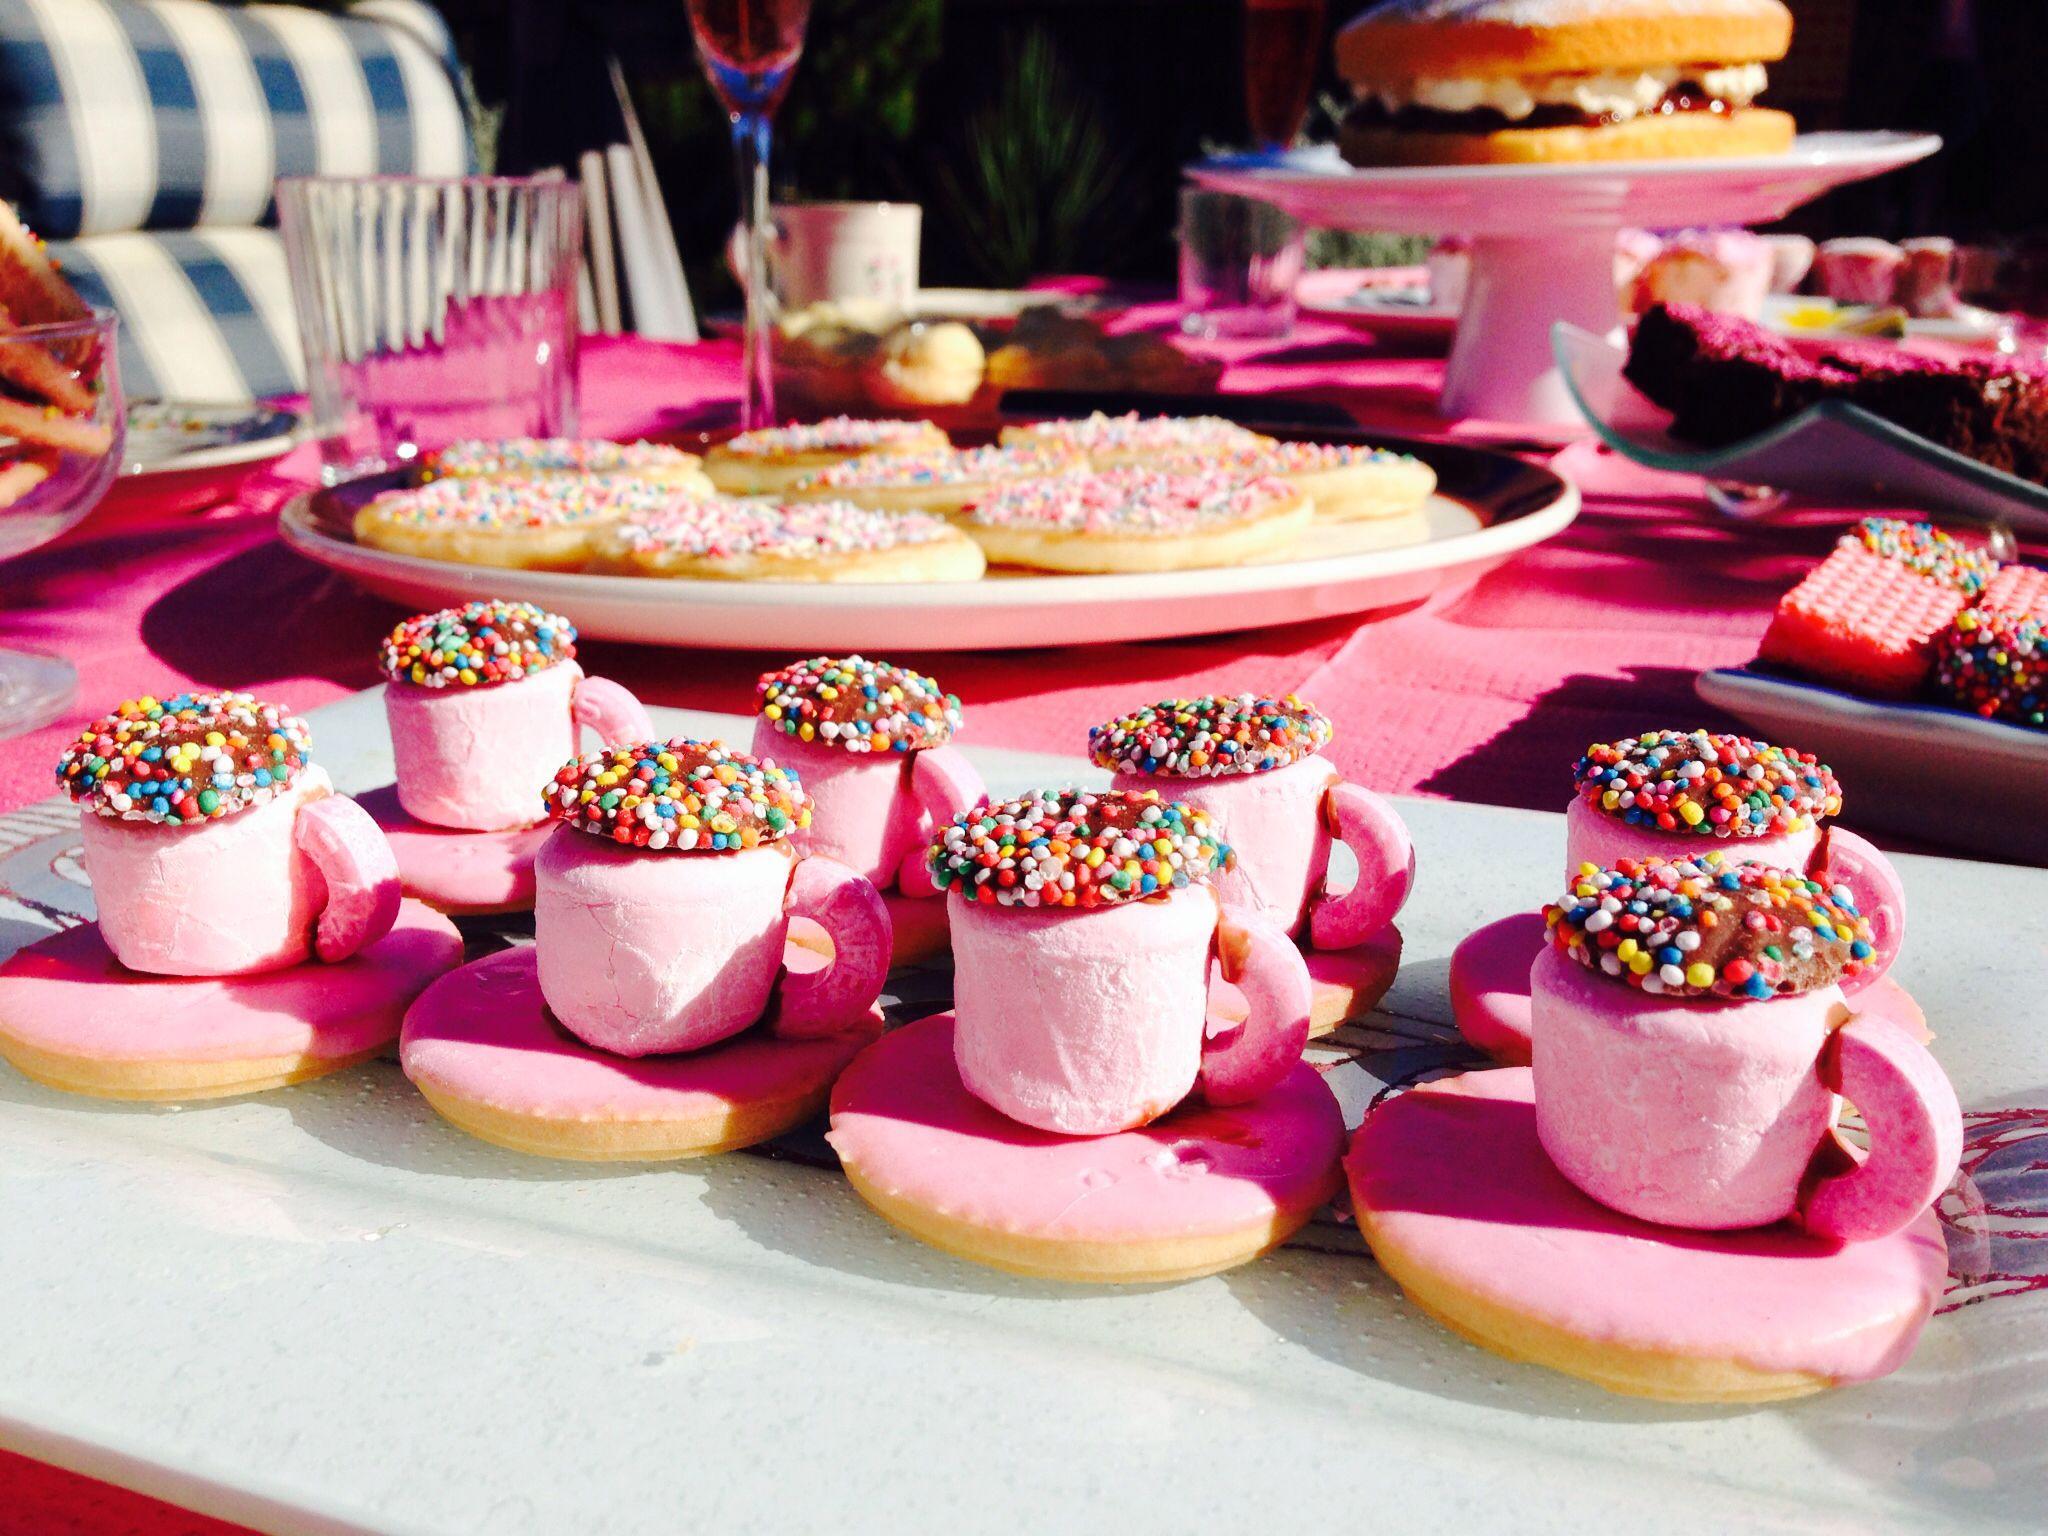 finger food ideas for bridal shower%0A High tea food ideas pink